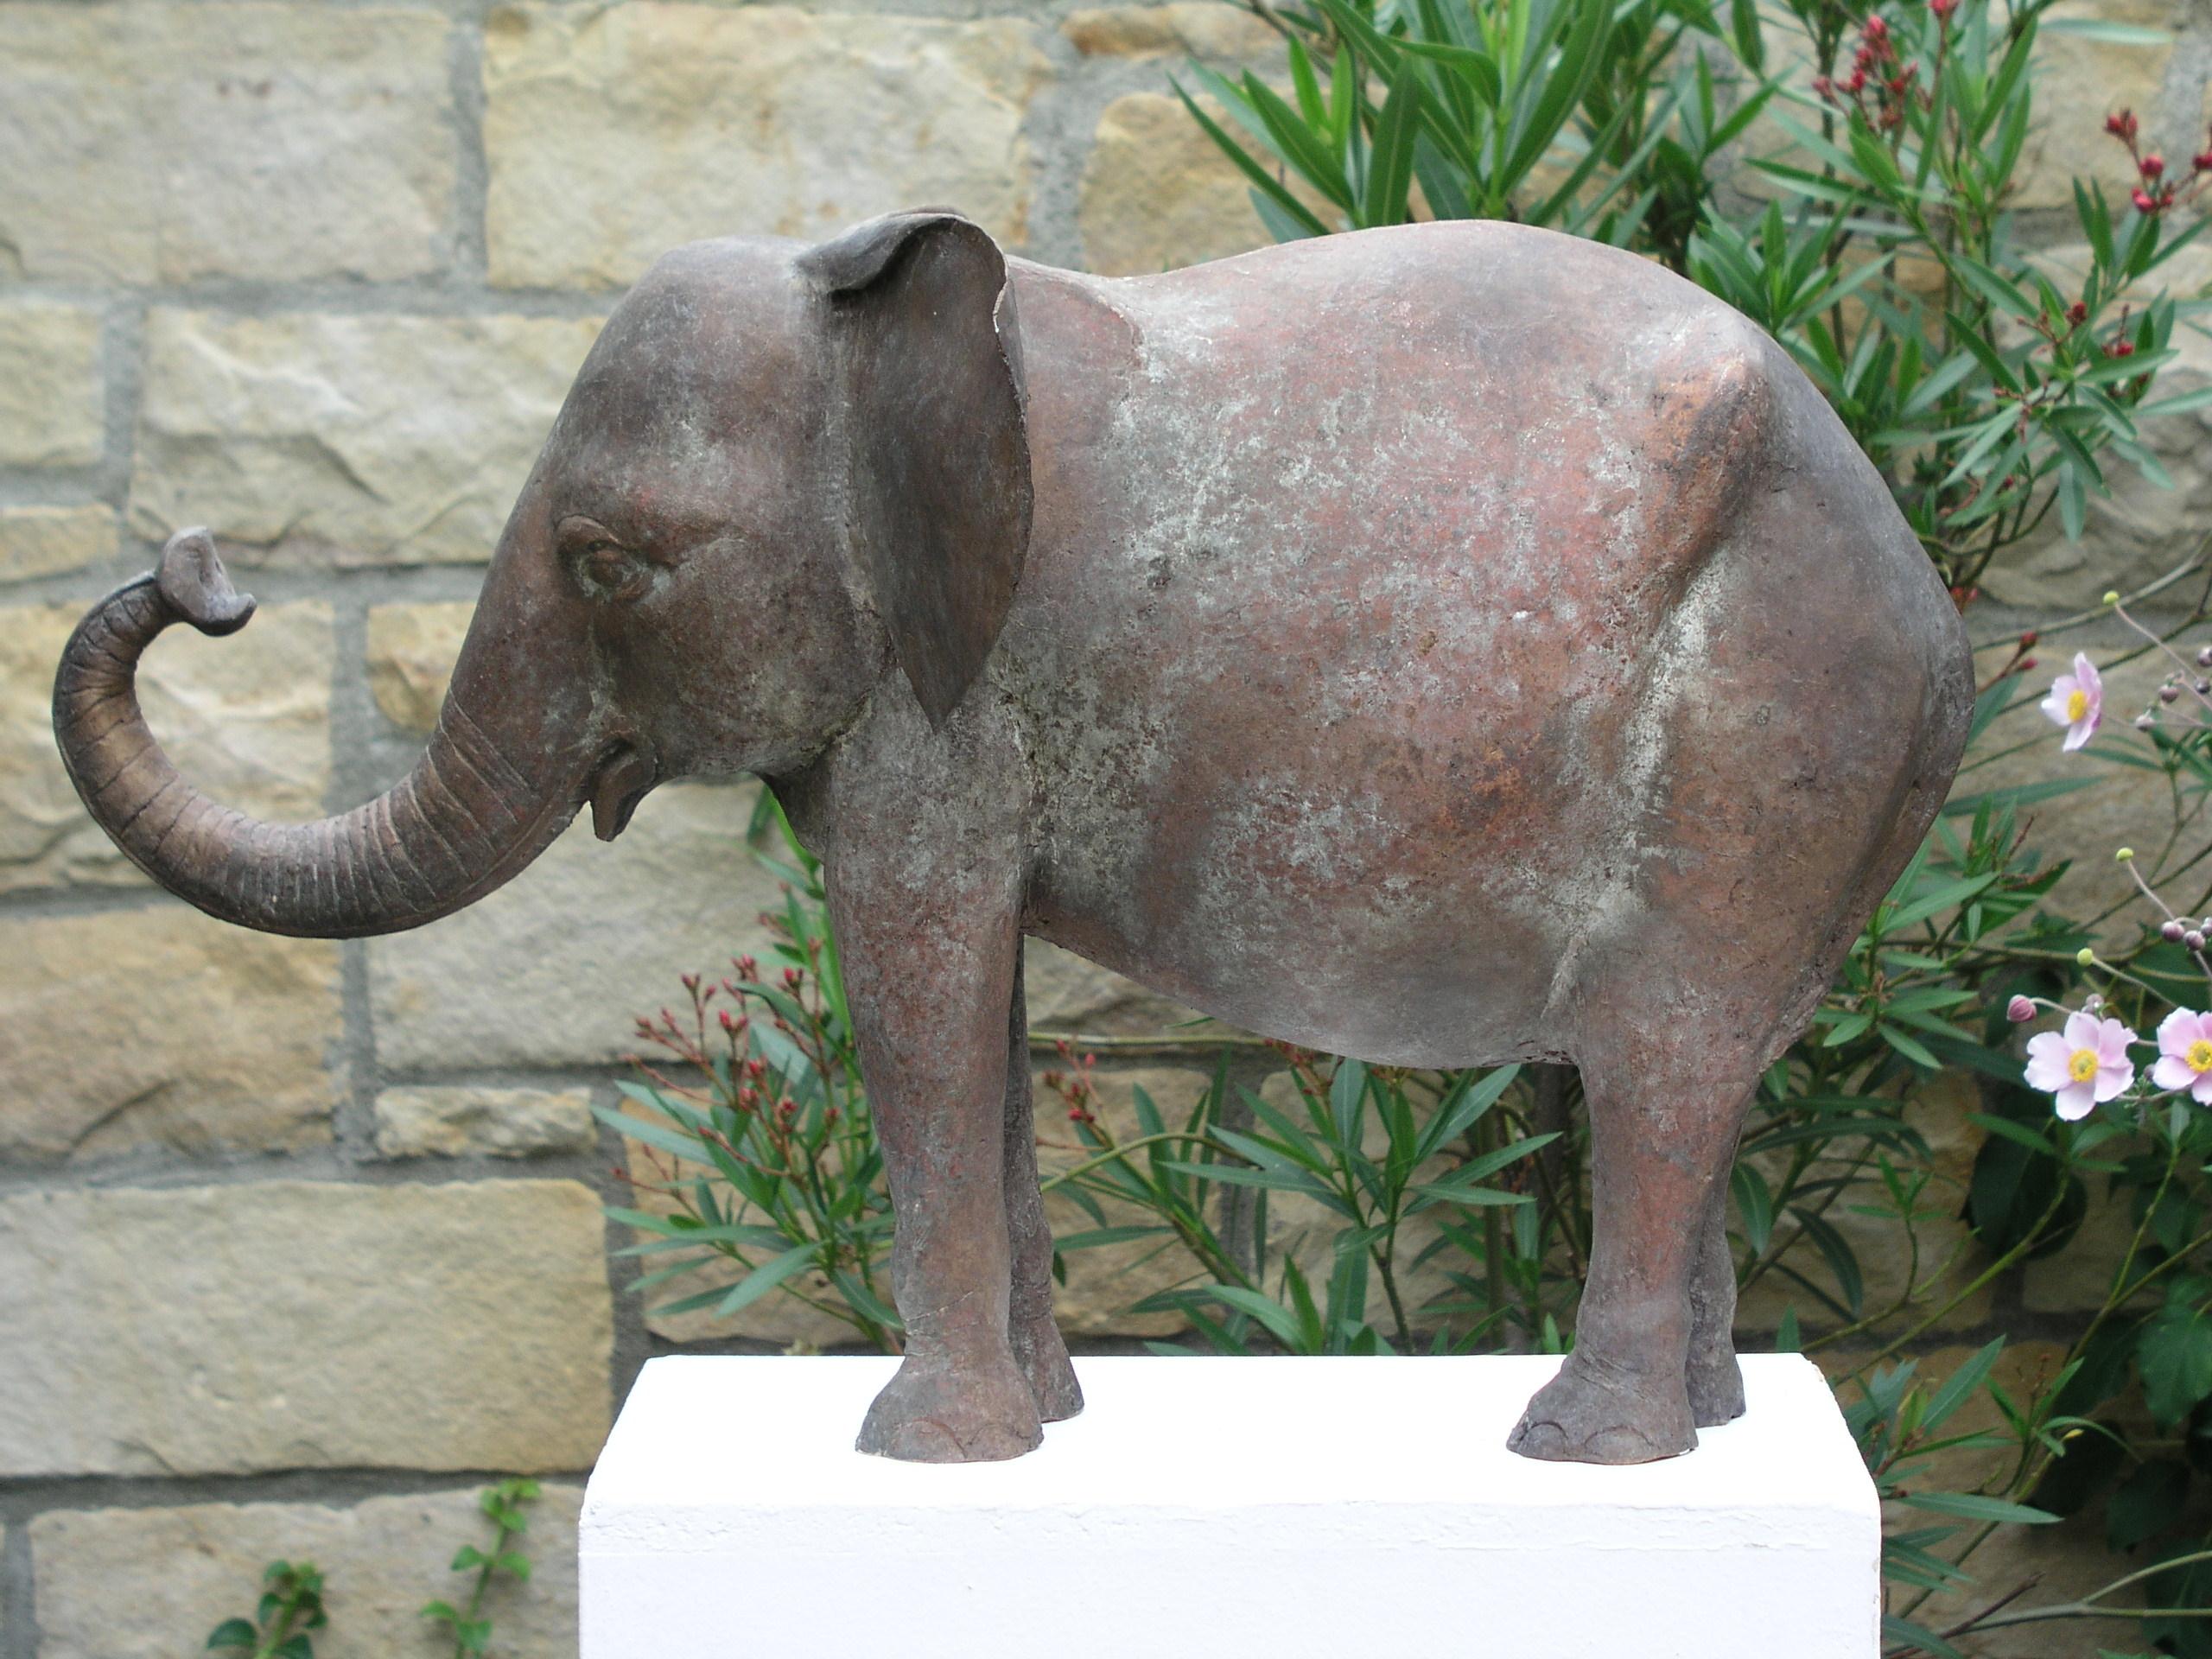 Kuh Hahn Elefant 08.2004 005